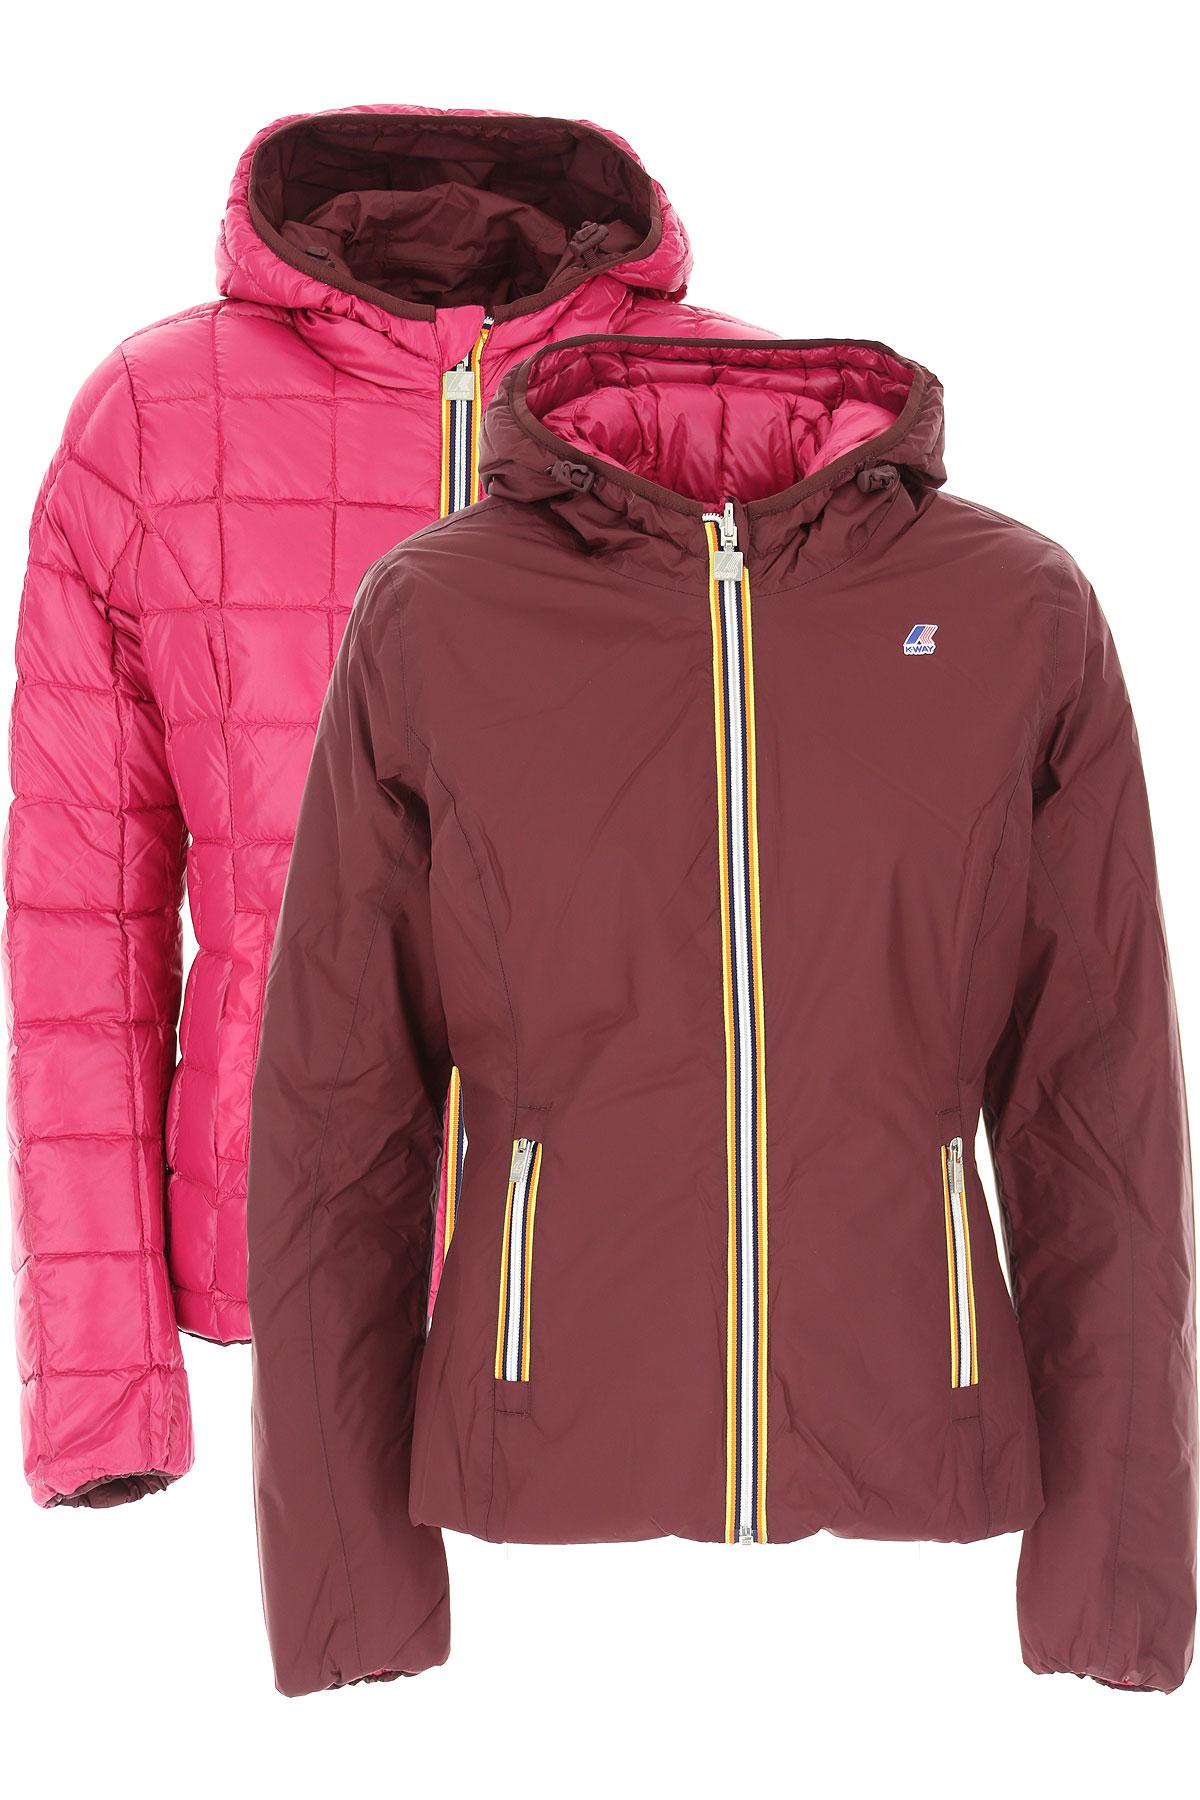 K-Way Down Jacket for Women, Puffer Ski Jacket On Sale, Wine, polyamide, 2019, 46